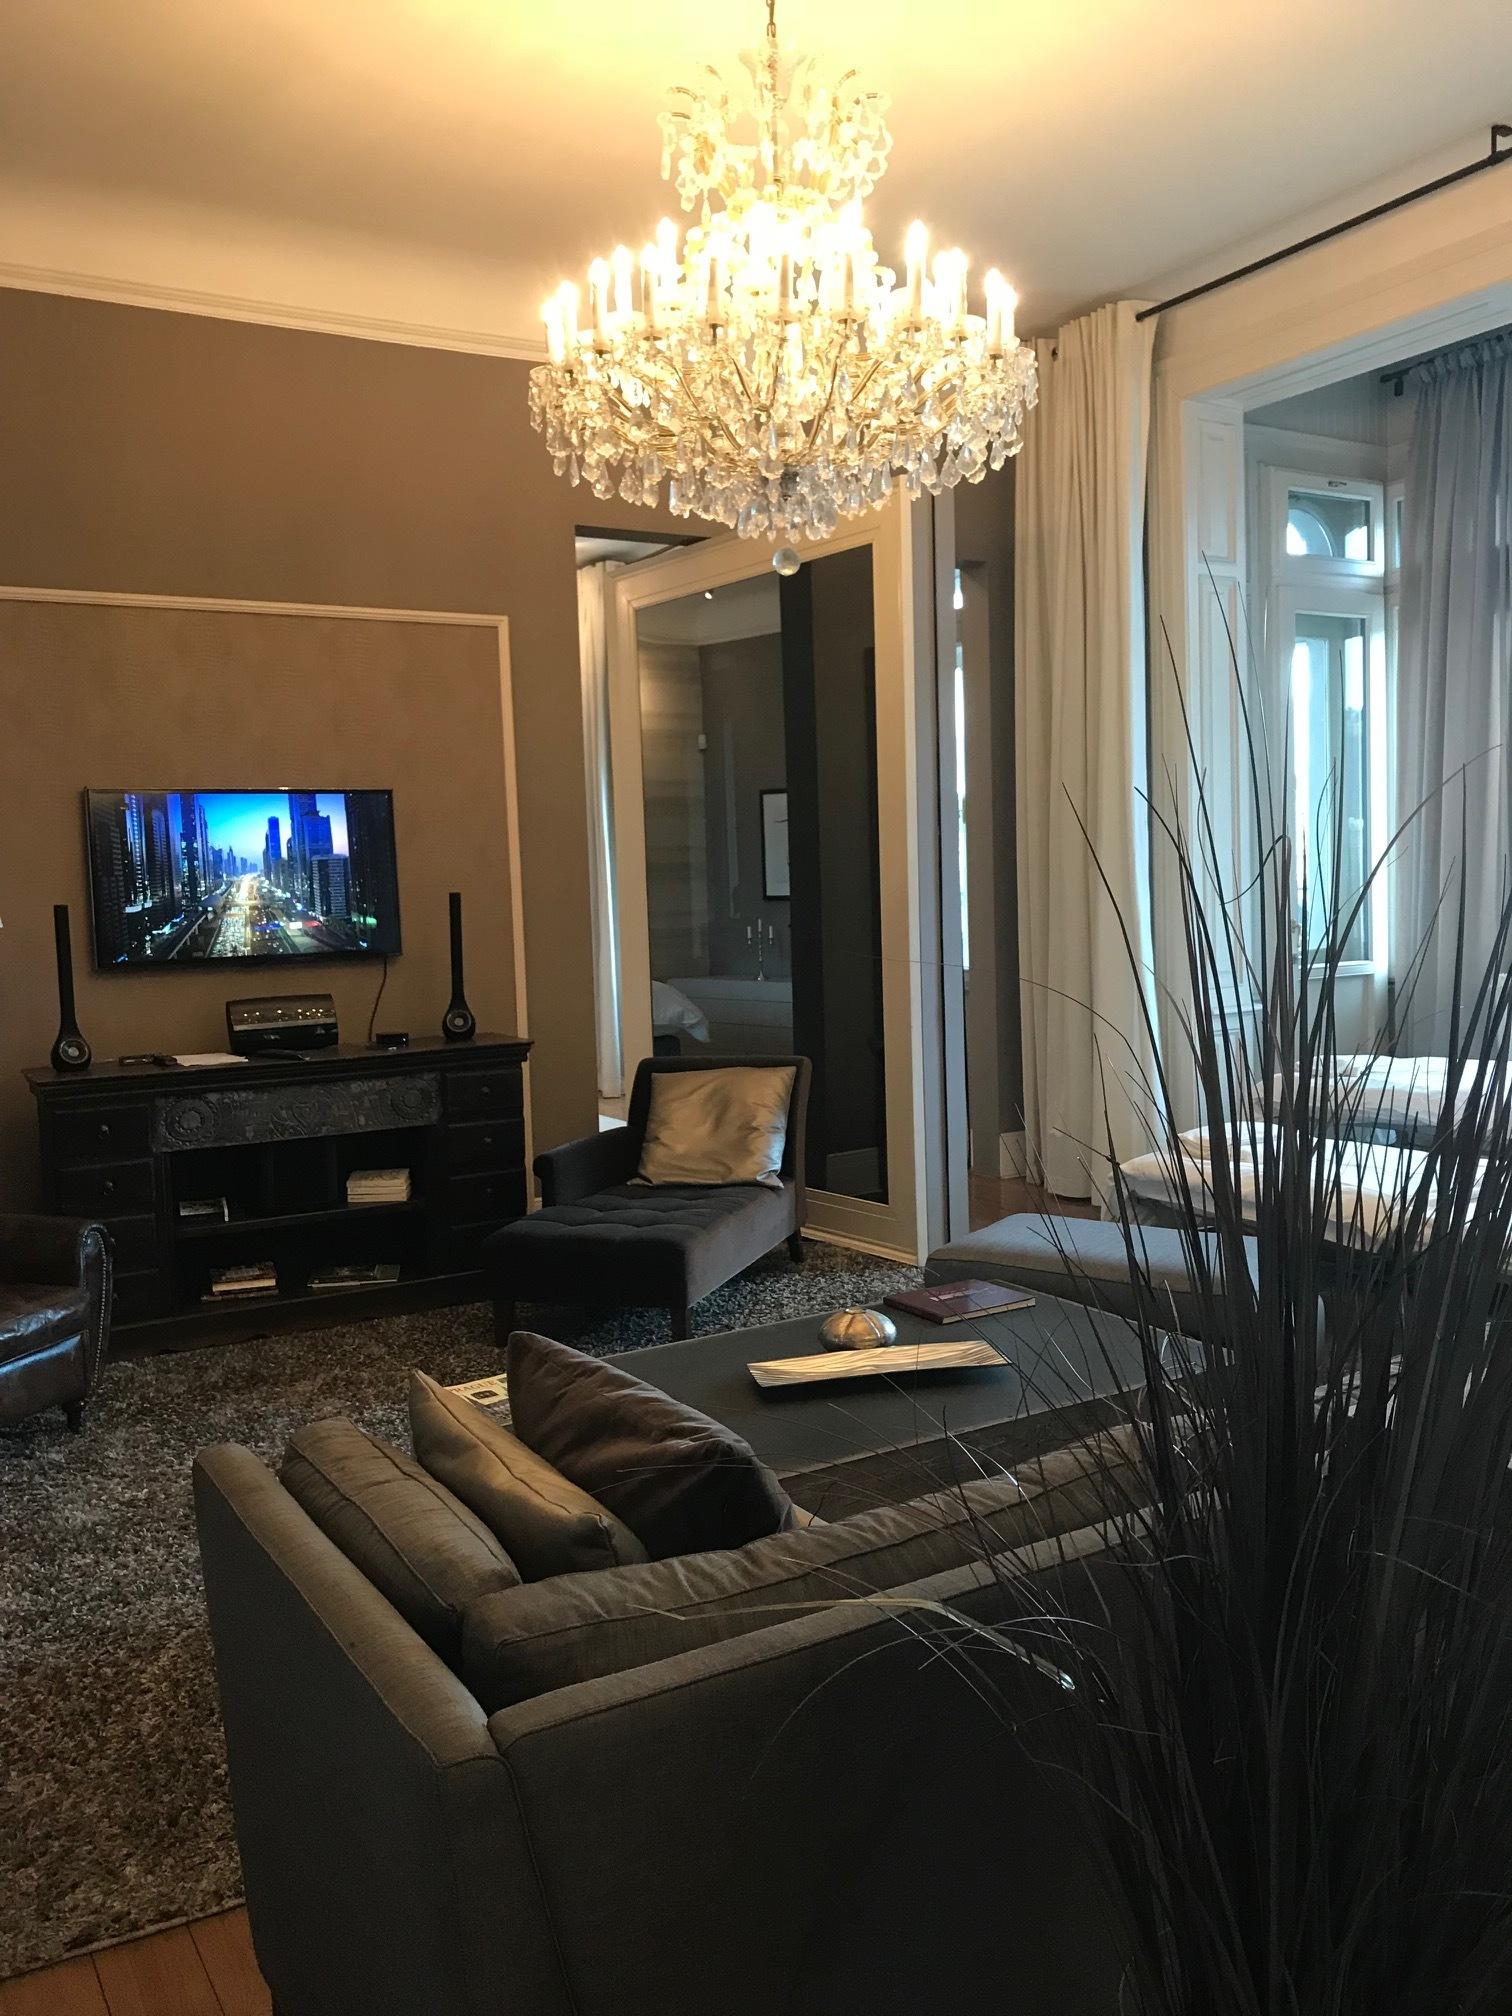 Our apartment in Prauge